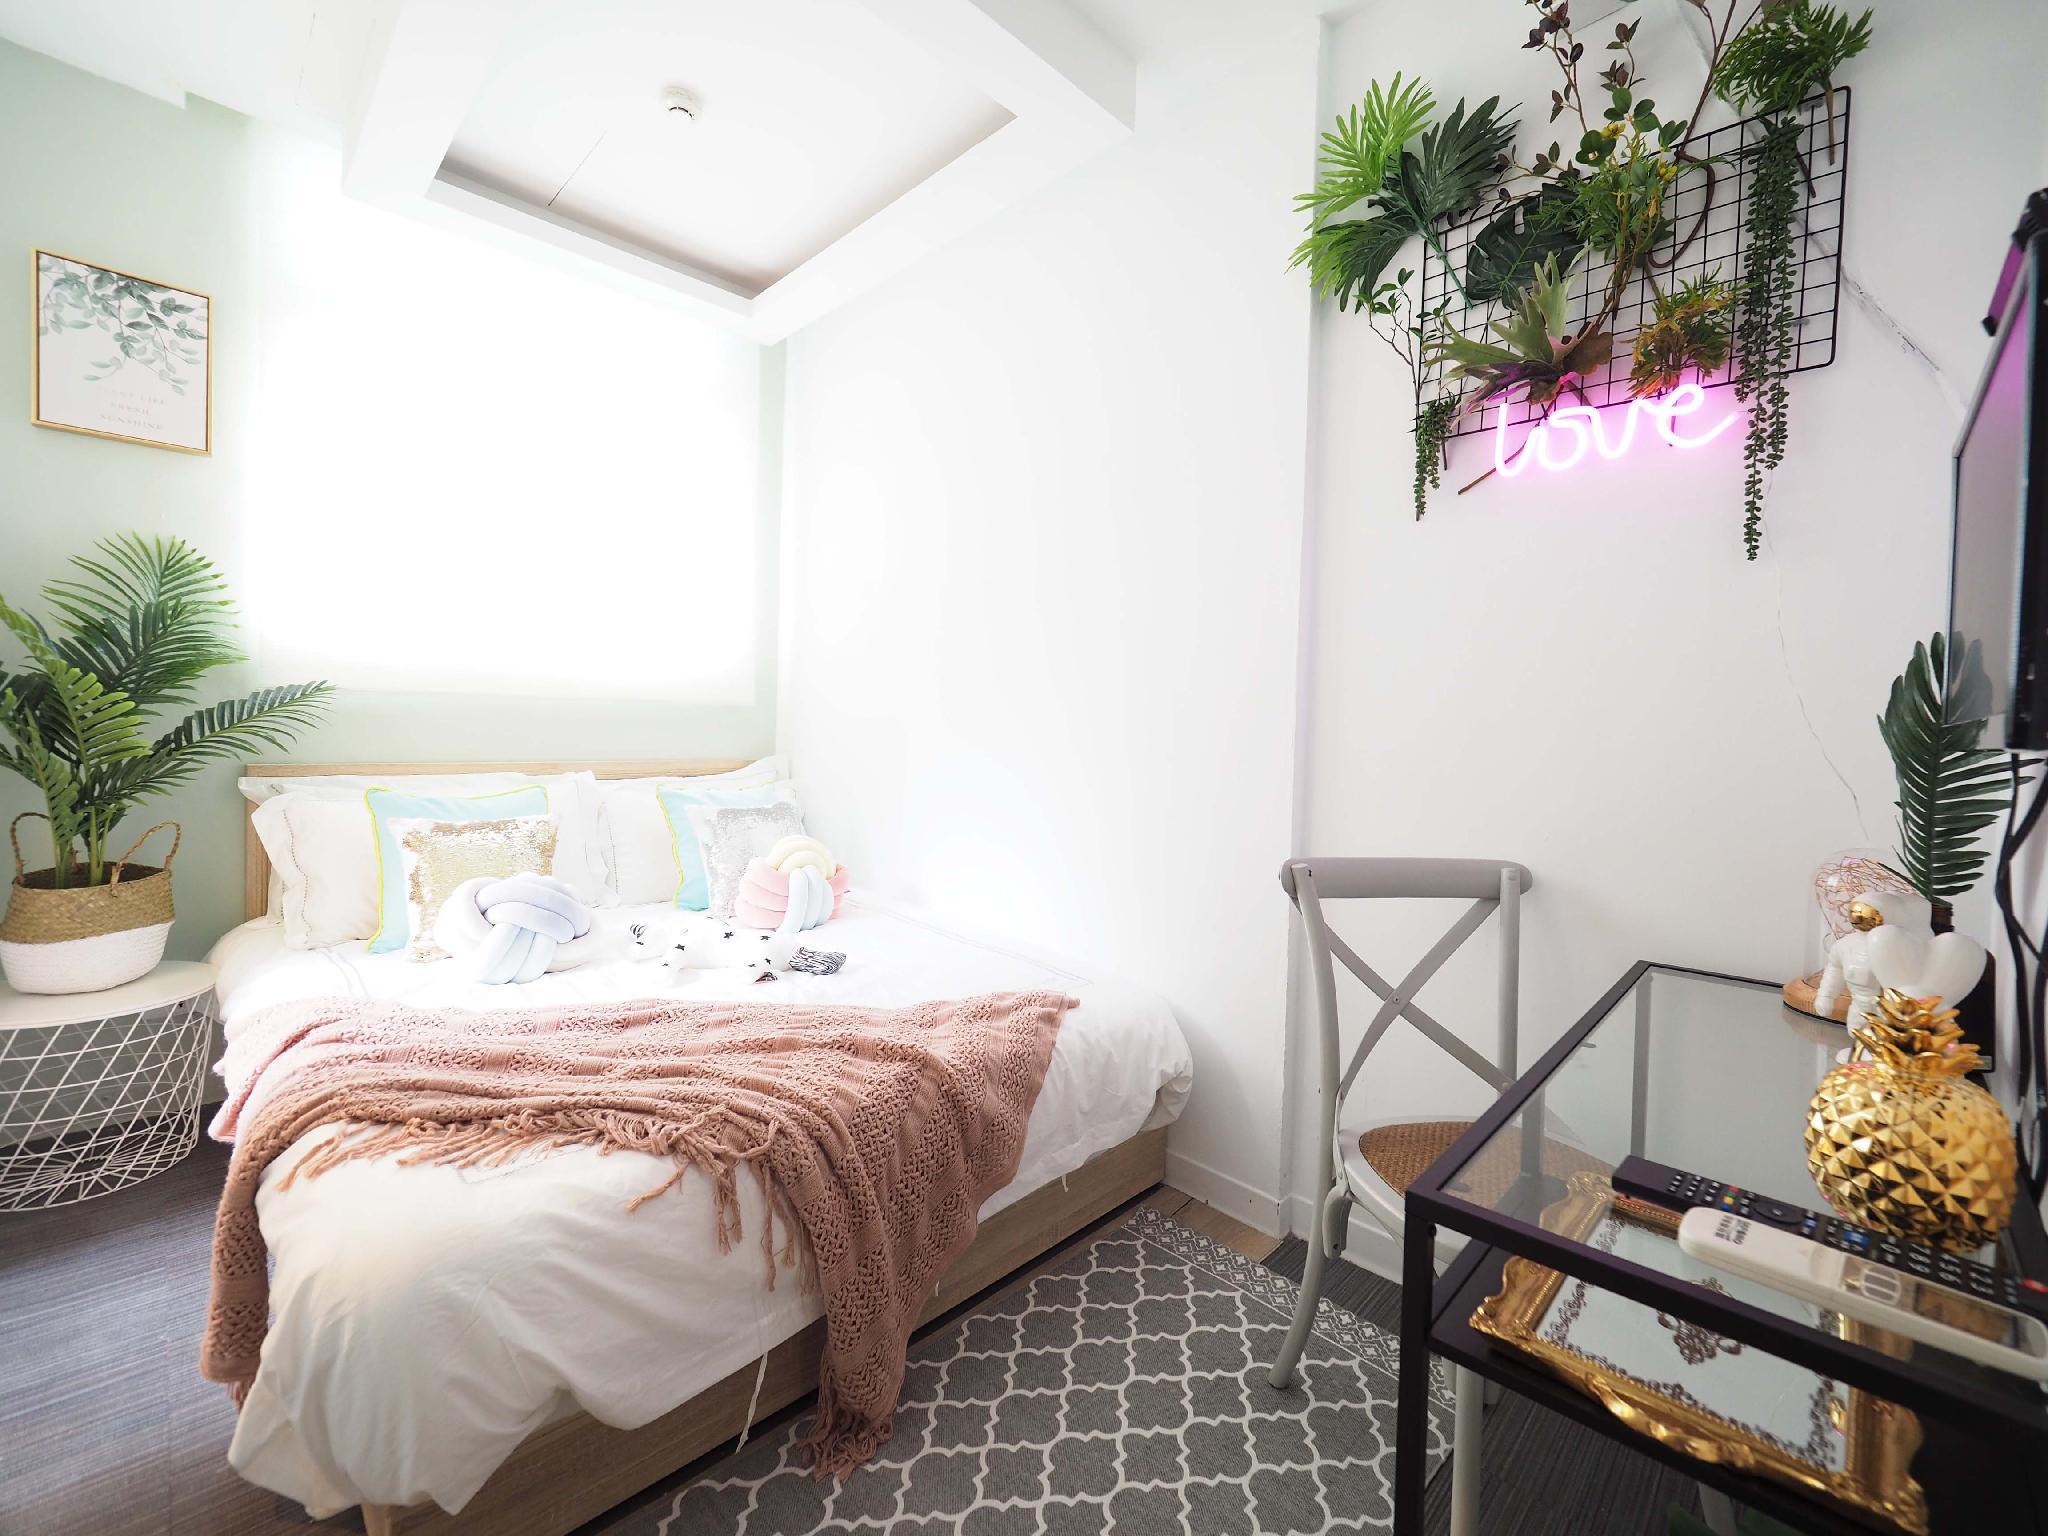 4C. Comfort Entire House